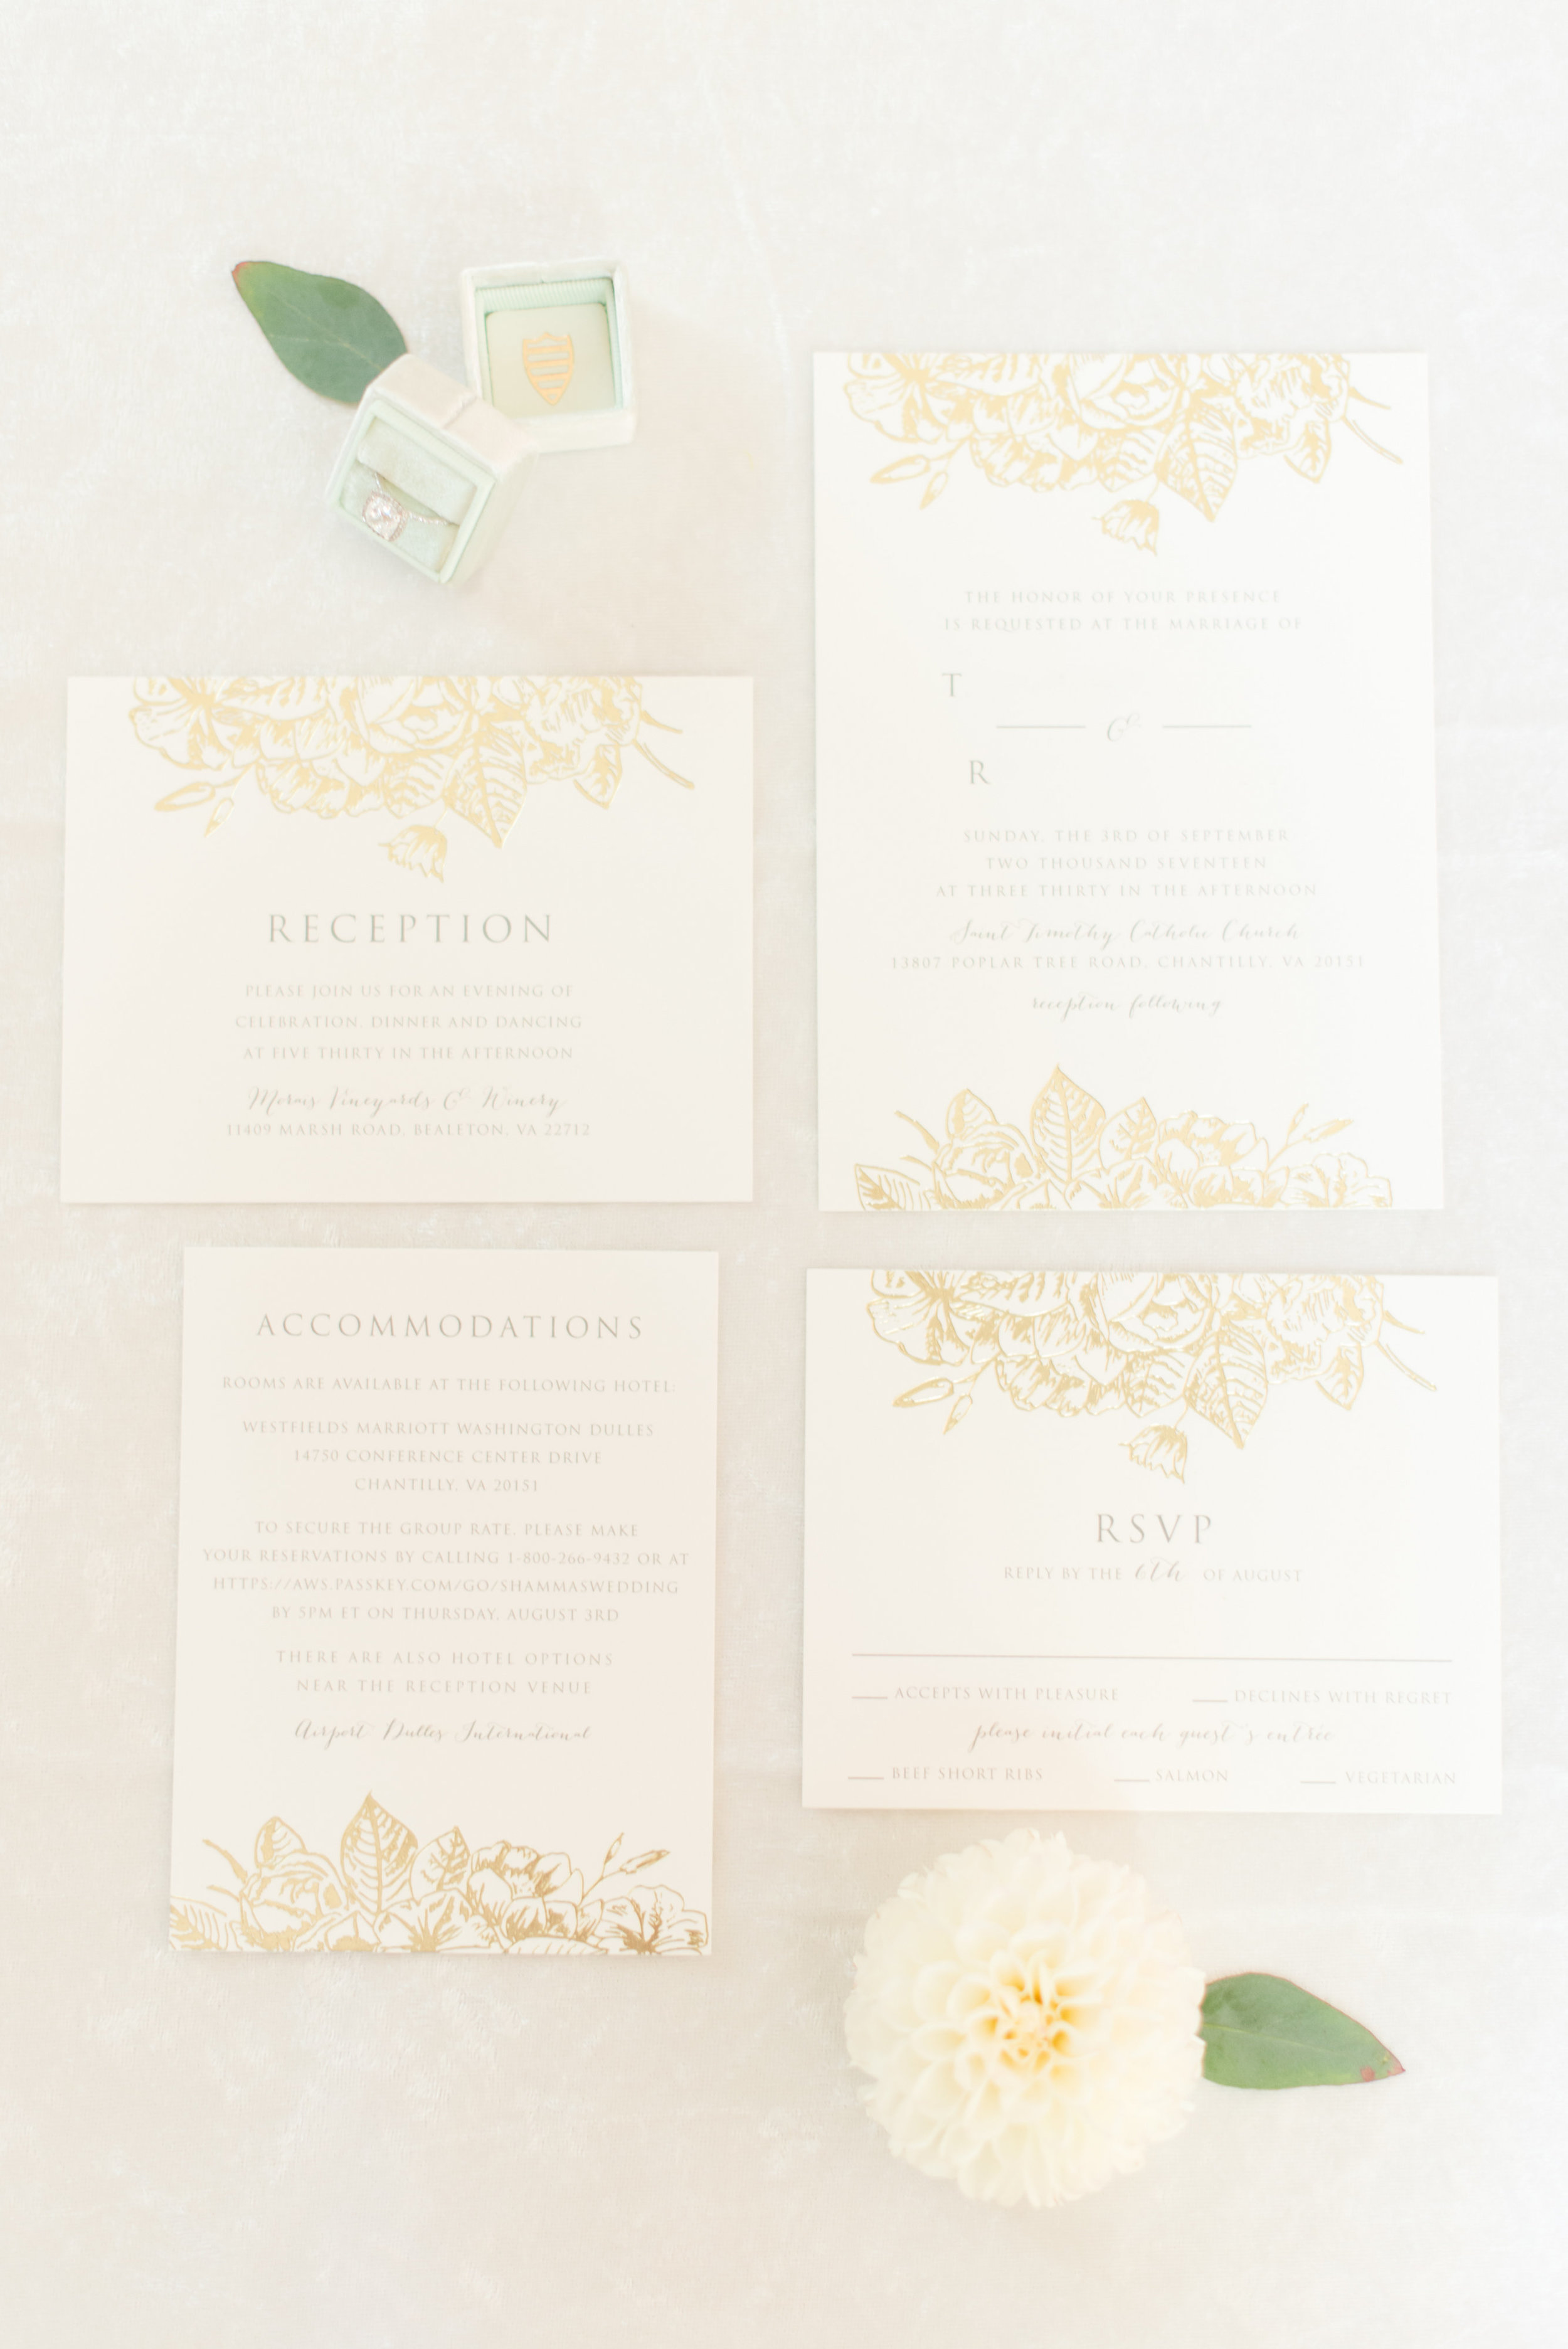 MORAIS VINEYARDS WEDDING A BEYOUTIFUL FETE EVENTS & DESIGN  - VIRGINIA AND DC WEDDING PLANNER 36.jpg